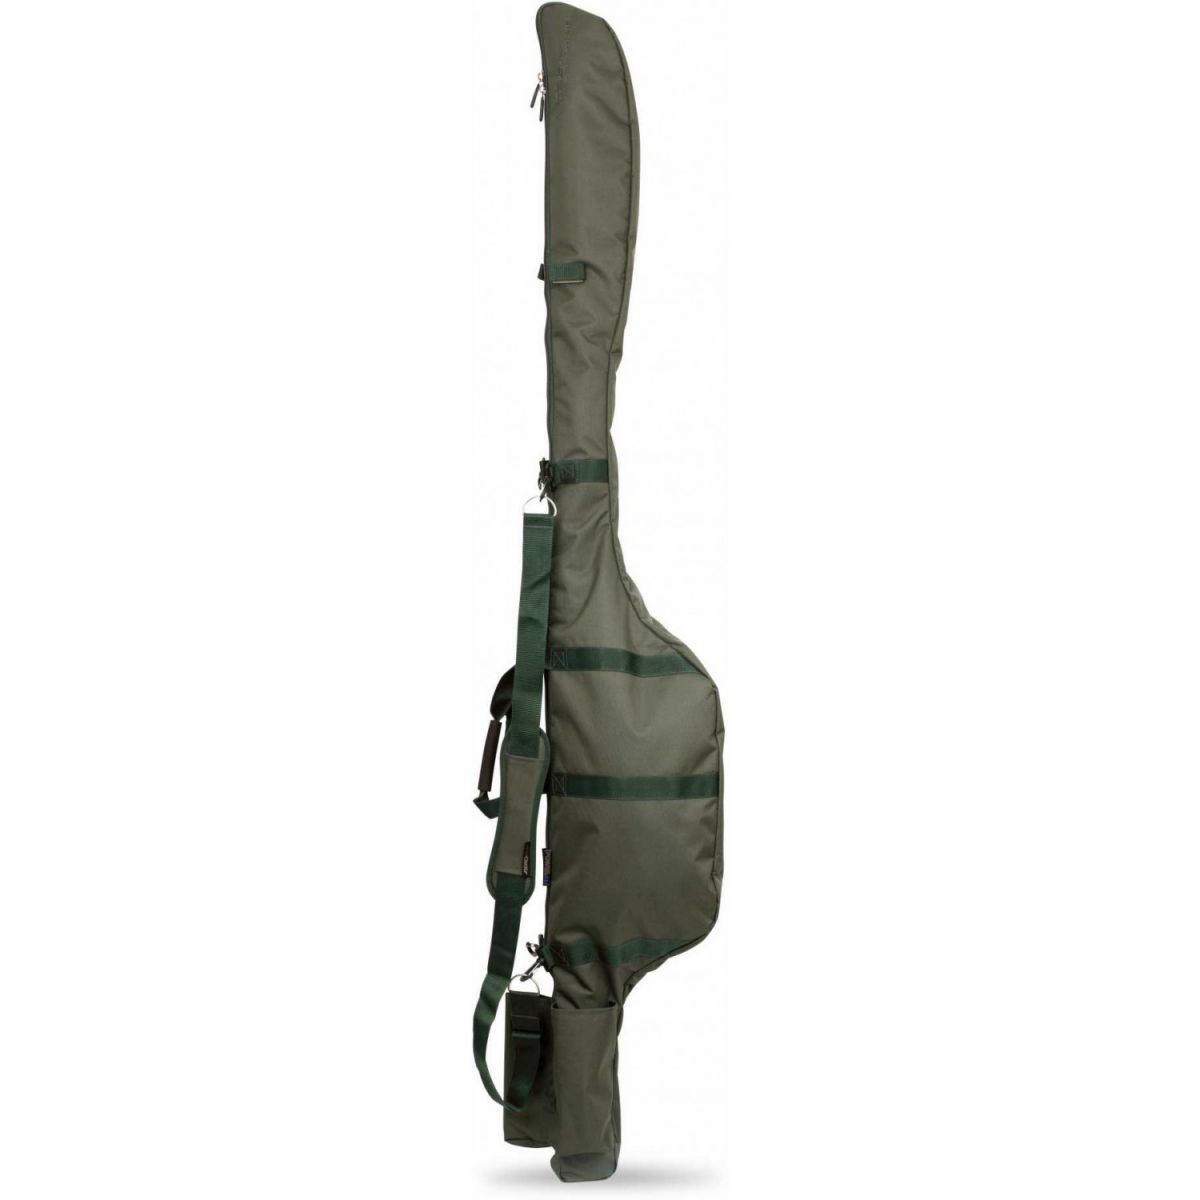 /produkty/112/obaly-na-pruty/Shimano/Puzdro-na-udice-Tribal-22-Compact-Rod-Sleeve